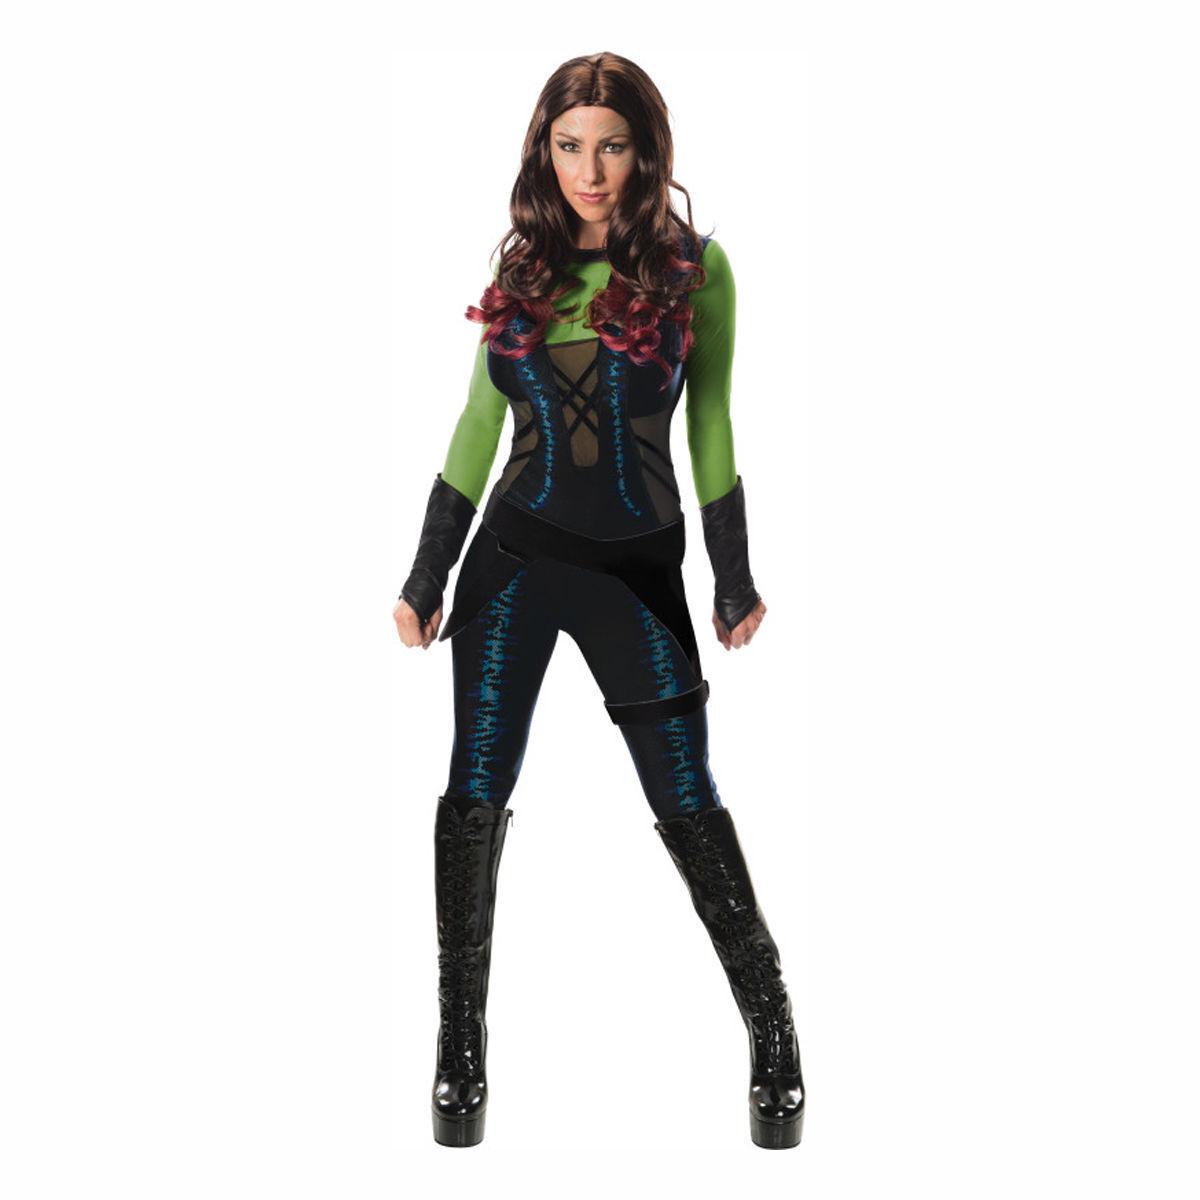 Top 10 Female Superhero Costumes | eBay